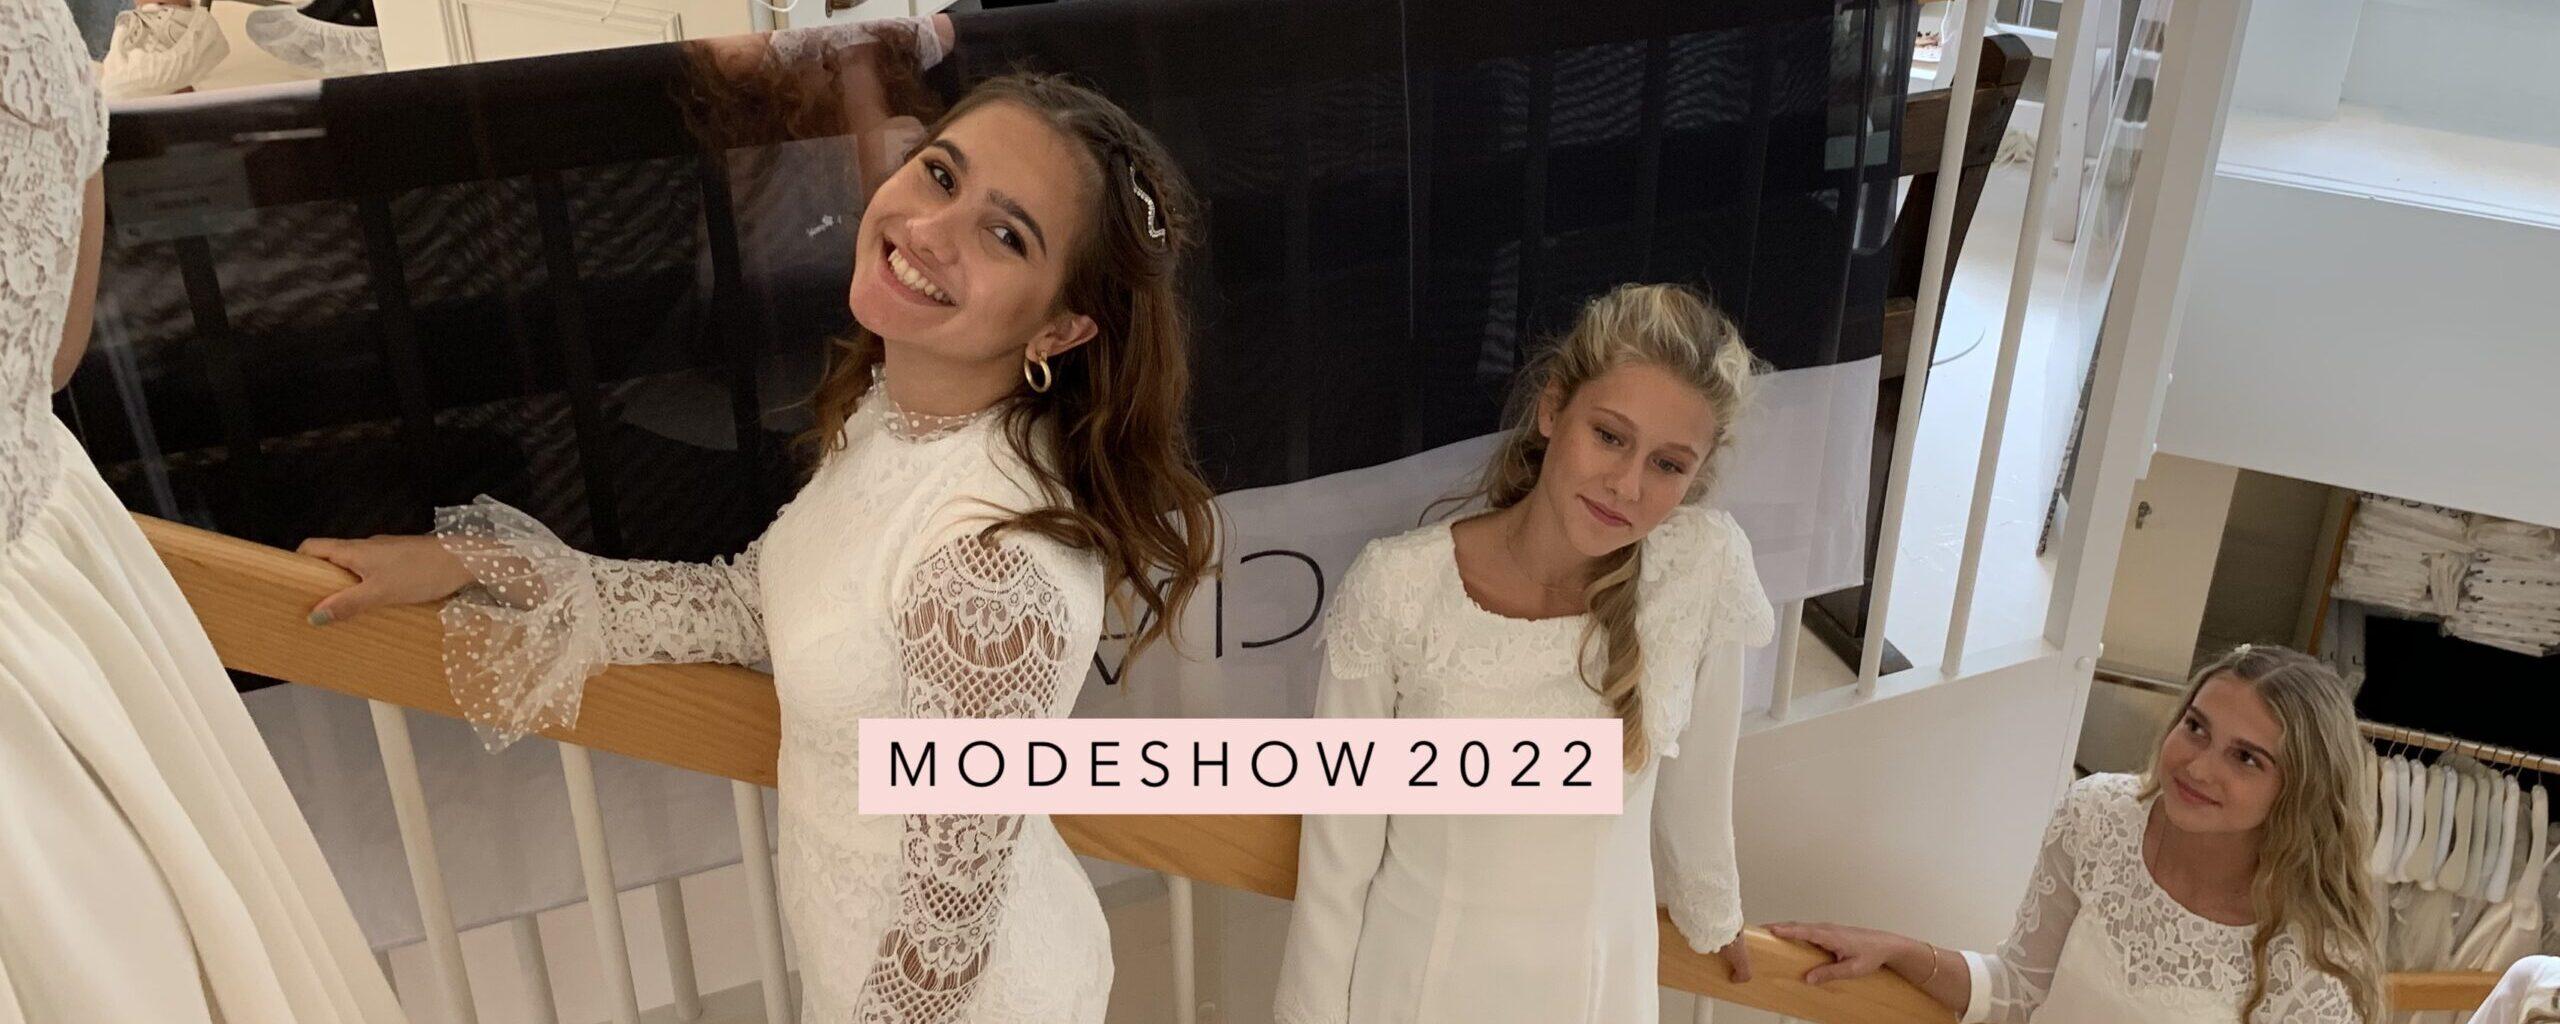 Konfirmationskjoler 2022 Modeshow